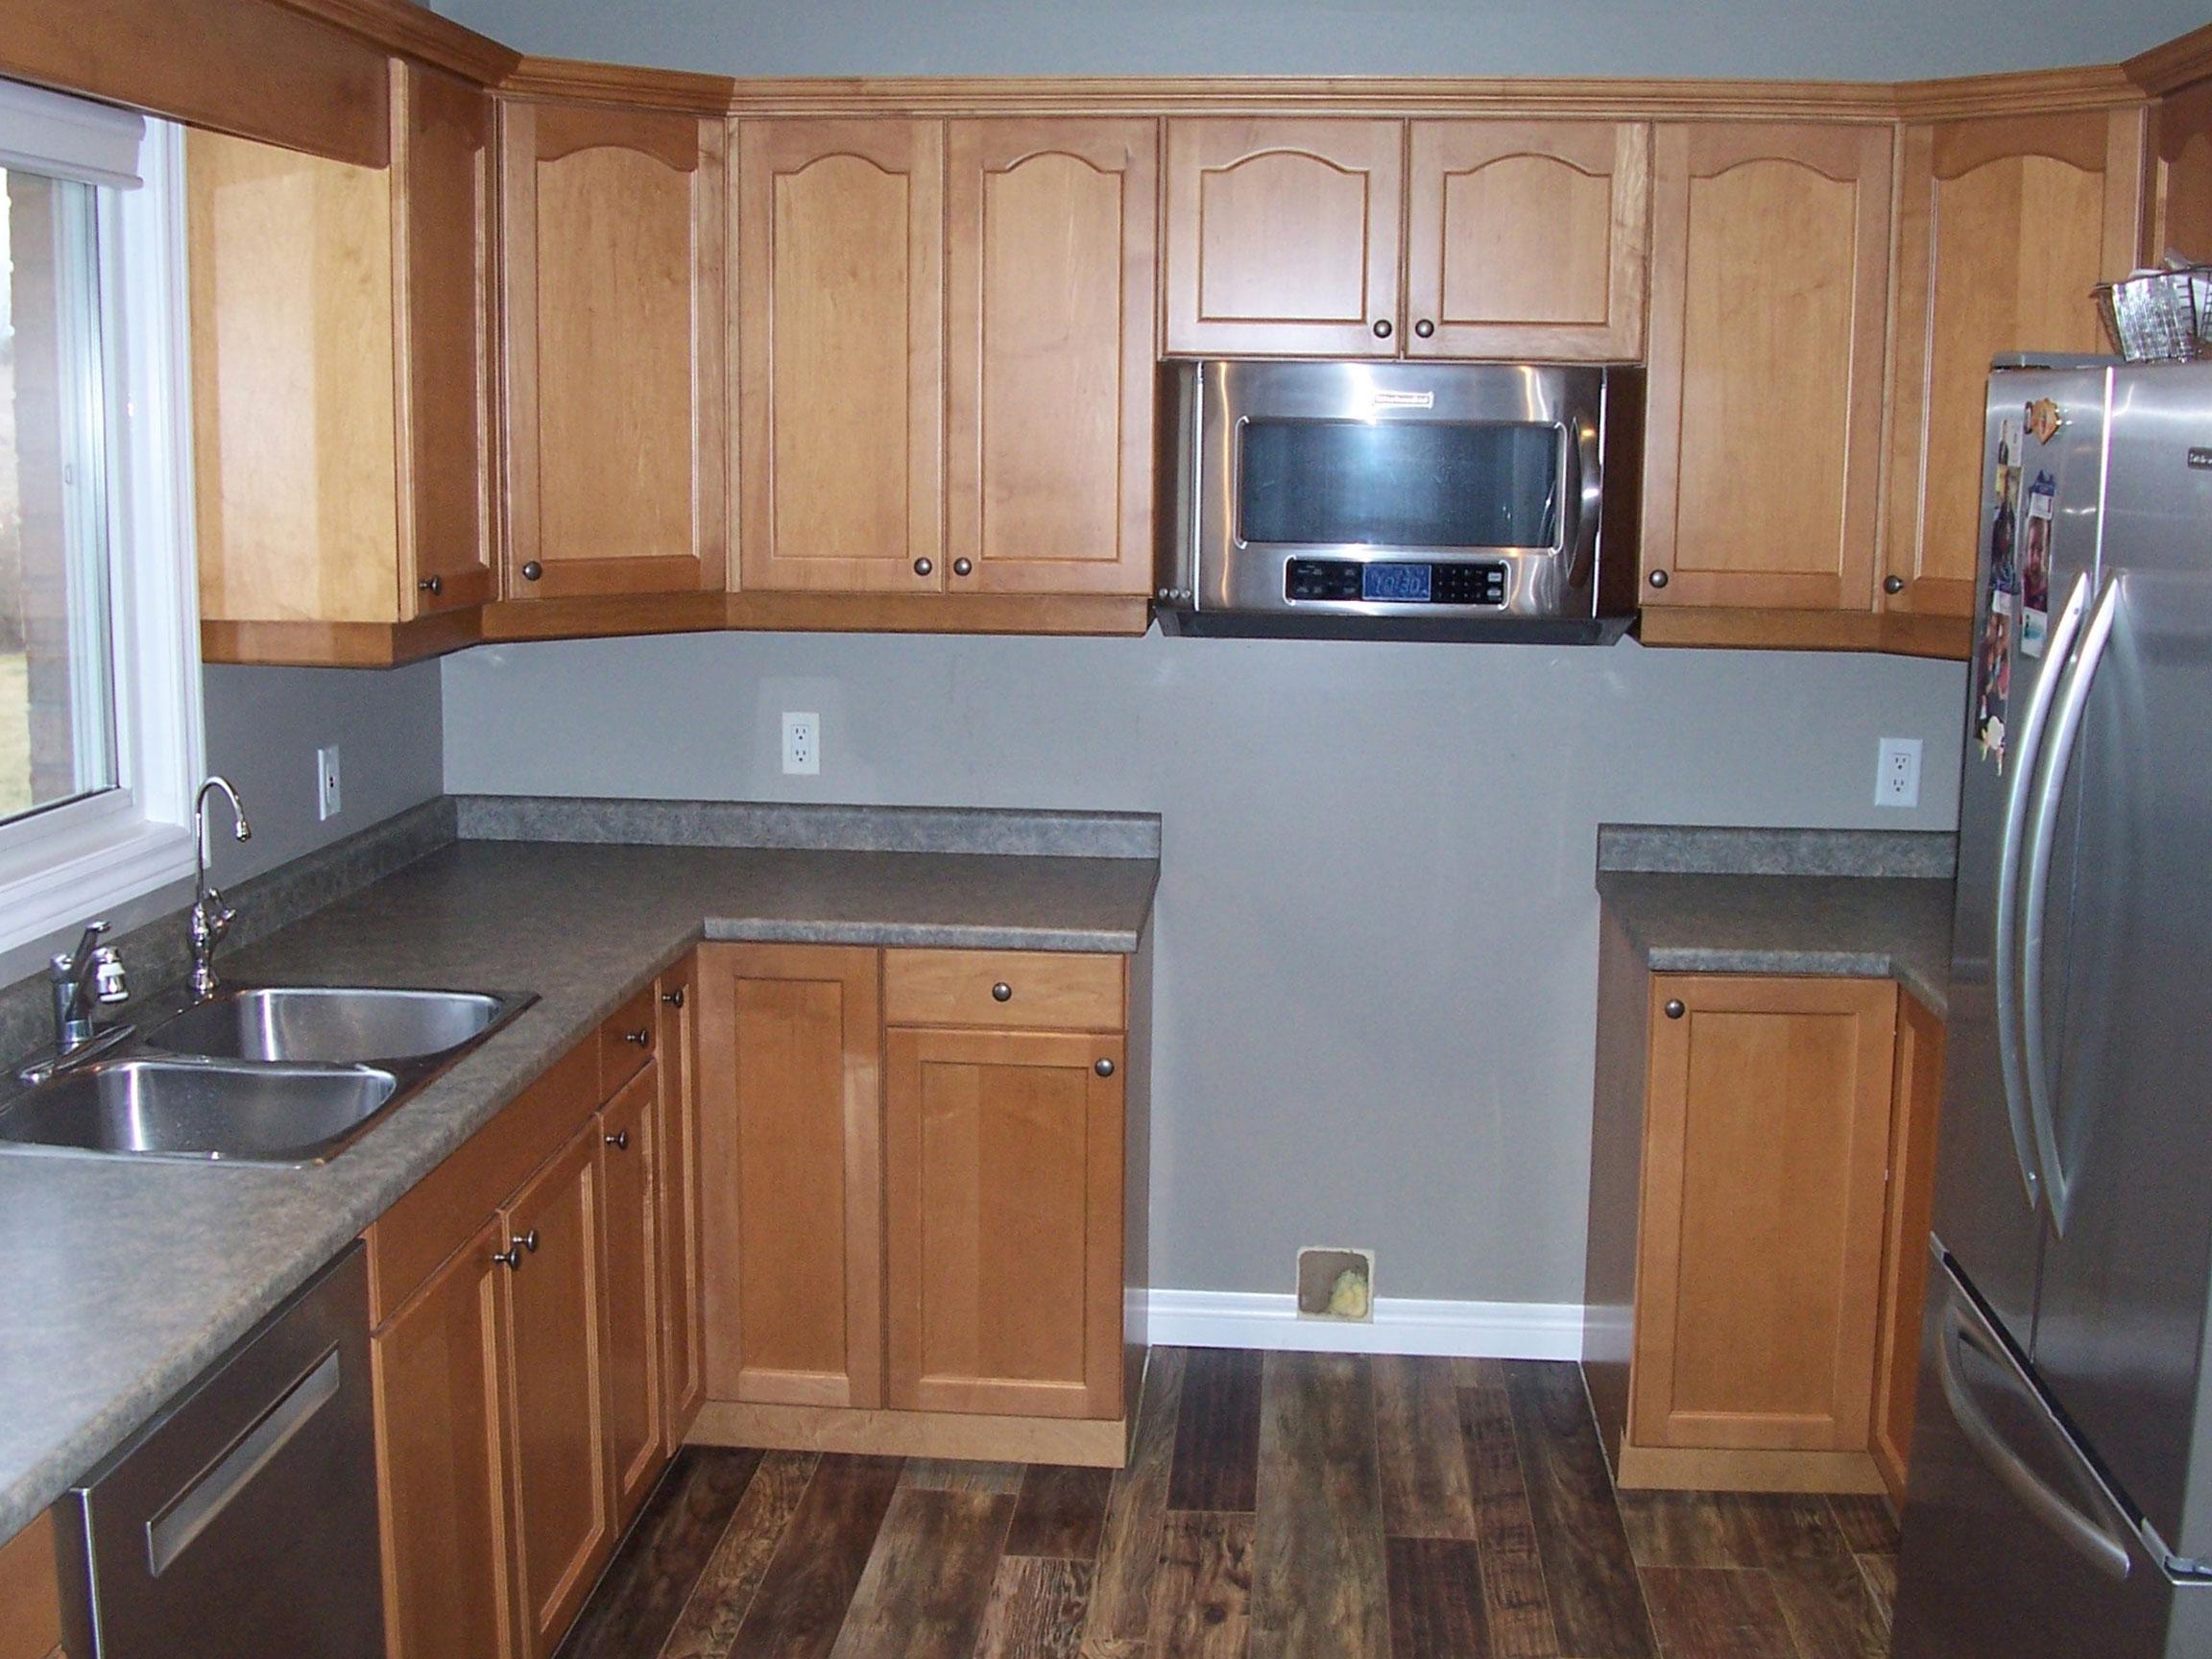 Kitchen Counter Backsplash Before